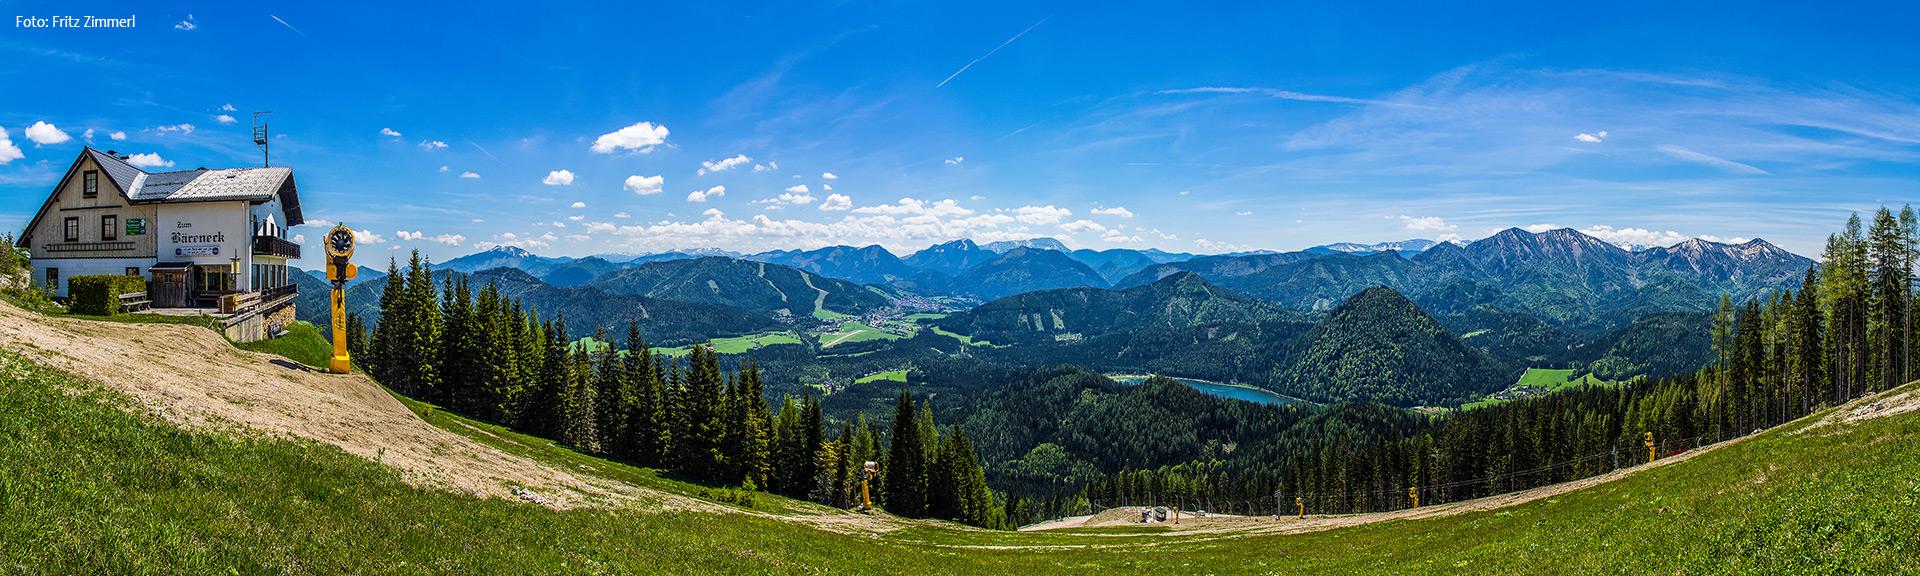 Baereneck-Panoramablick-Gemeindealpe_Fritz-Zimmerl_2014-05-21